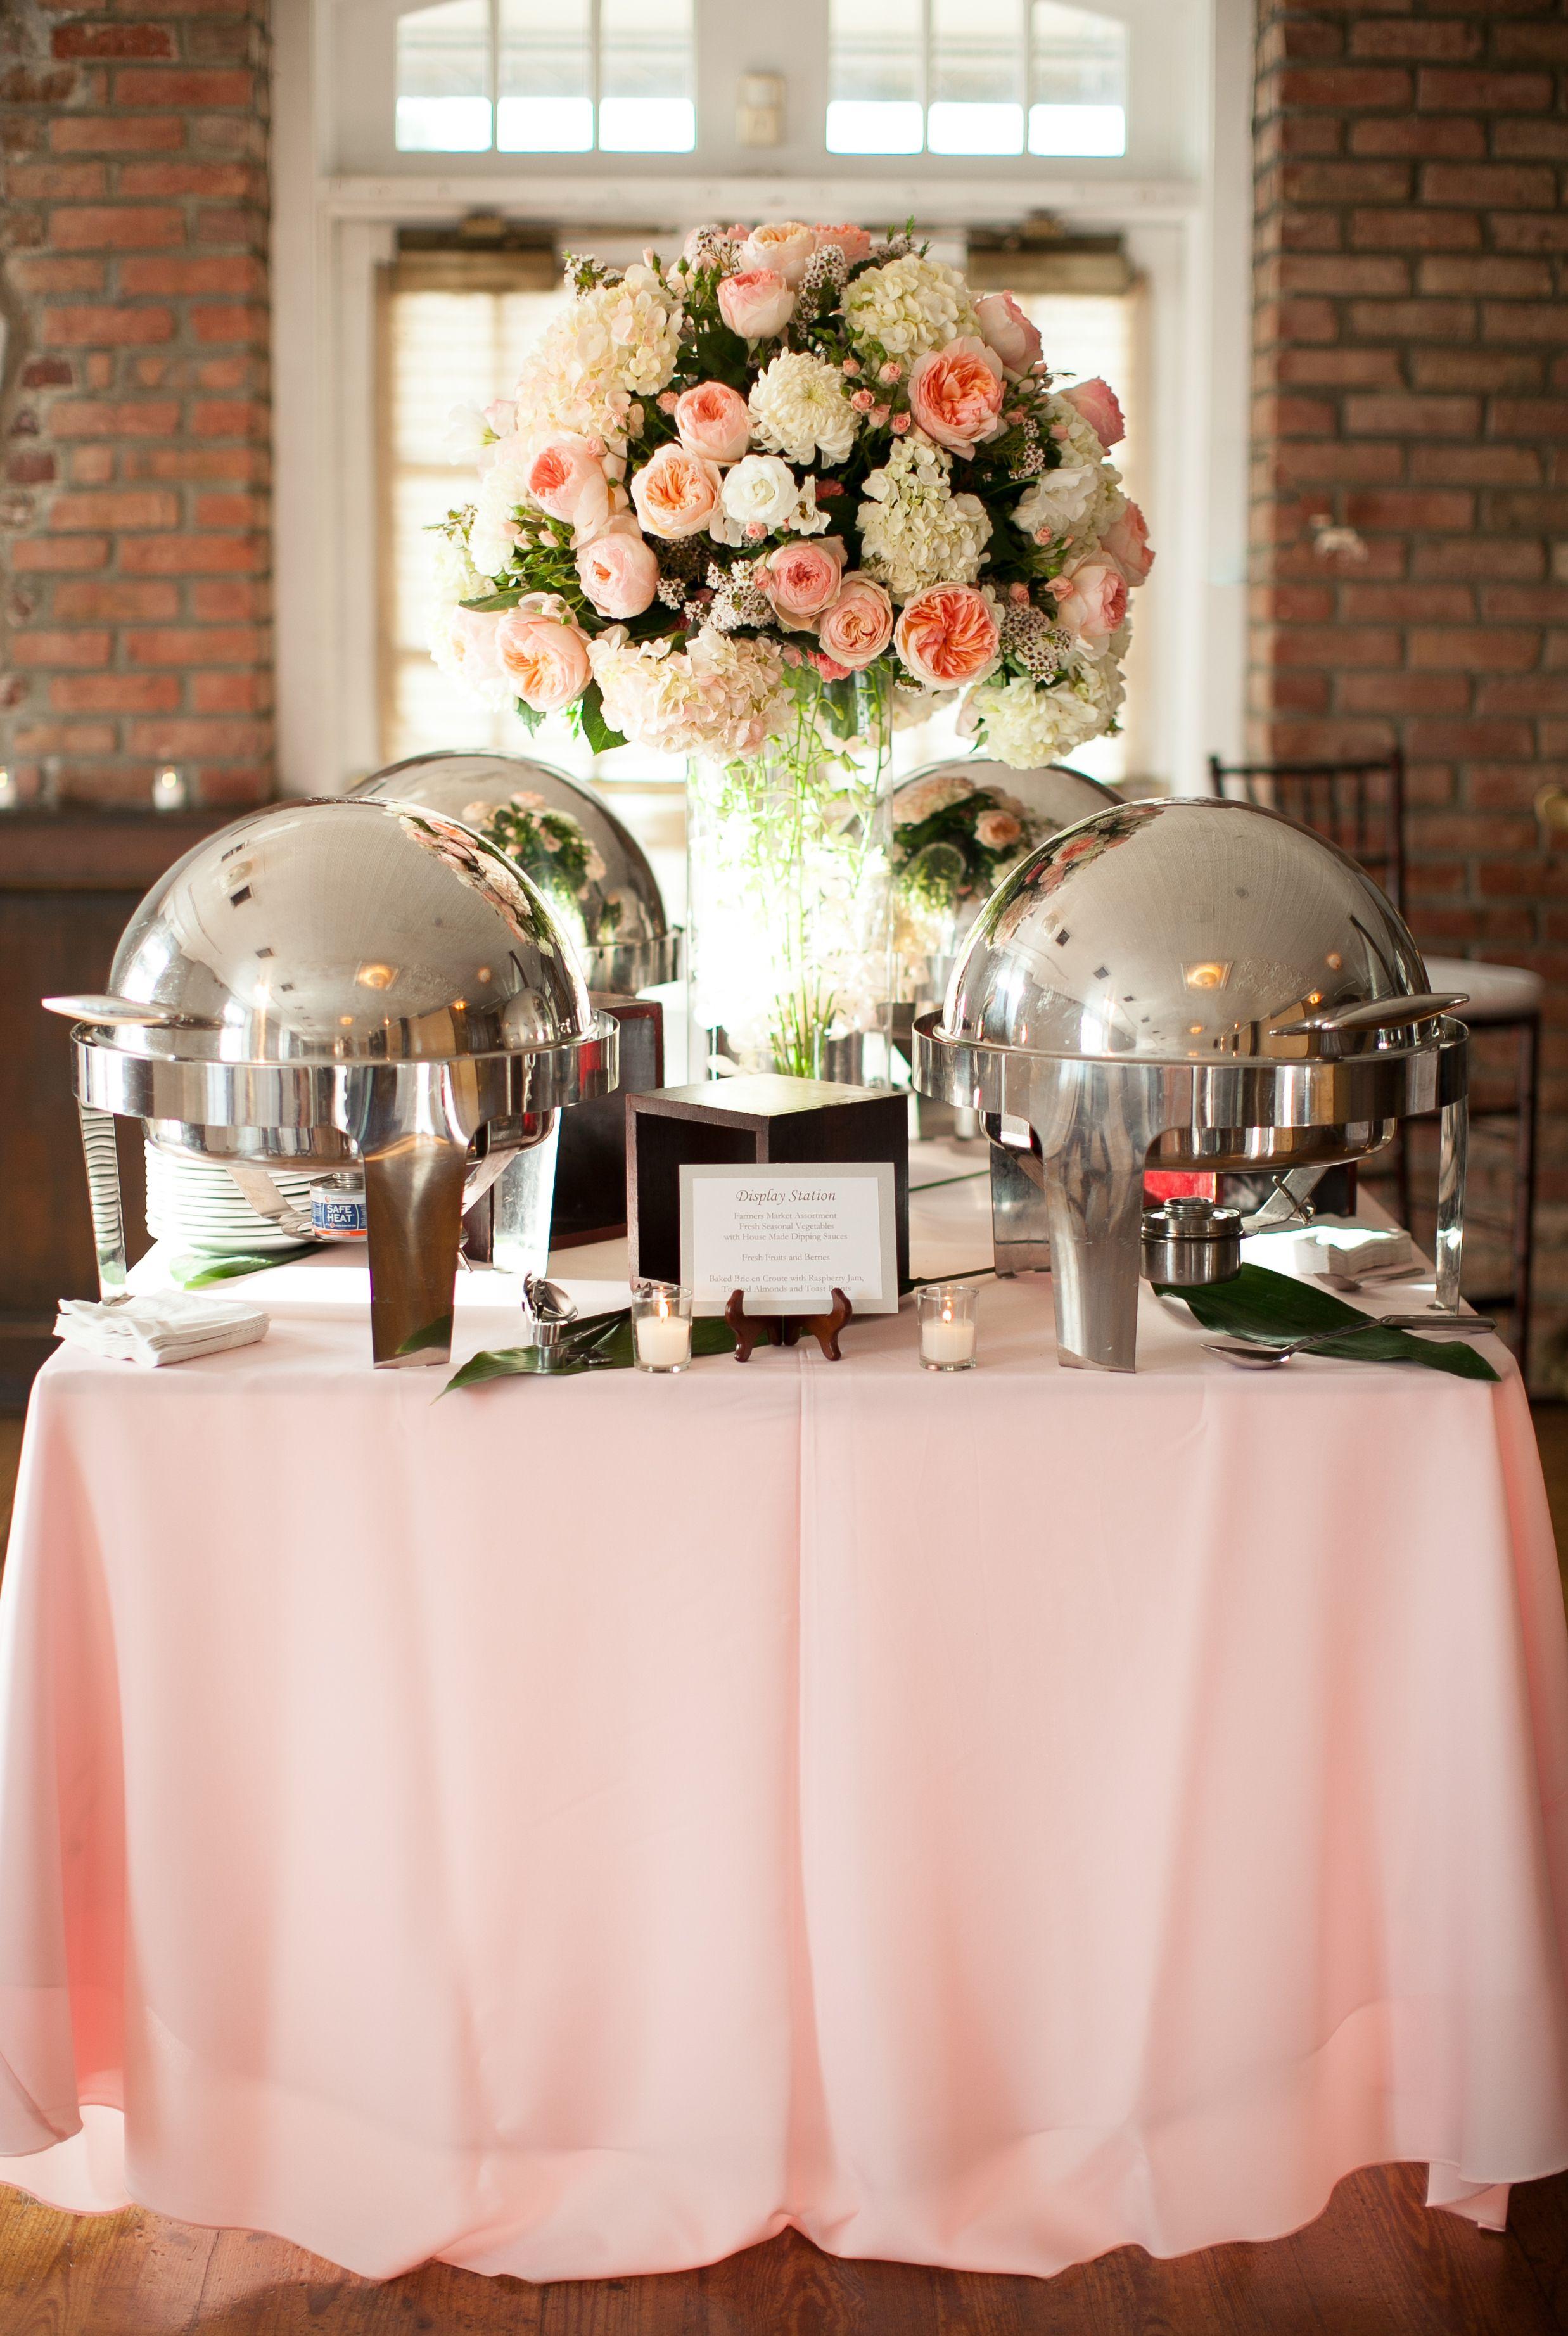 Wedding Planners Charleston Sc Event Planning Consultants Luxury Wedding Planner Weddings By Color Wedding Planner